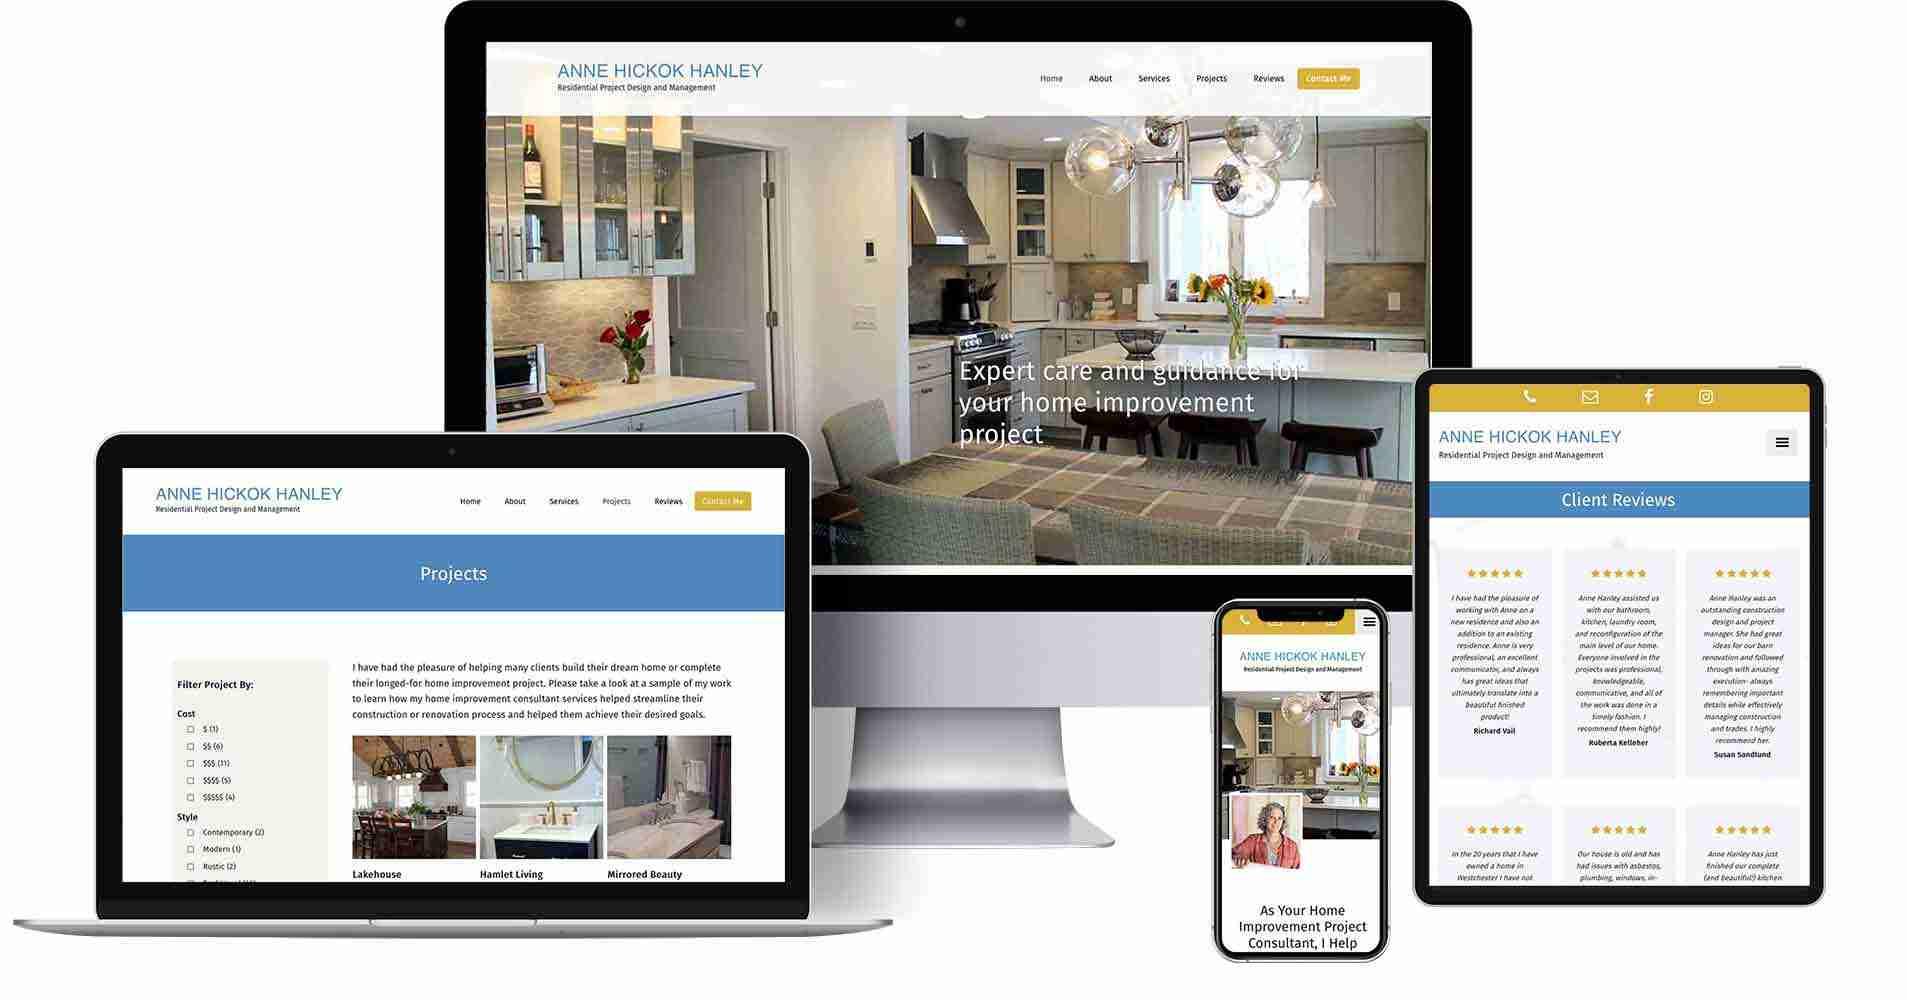 Anne Hickok Hanley - Renovation Consultant Website